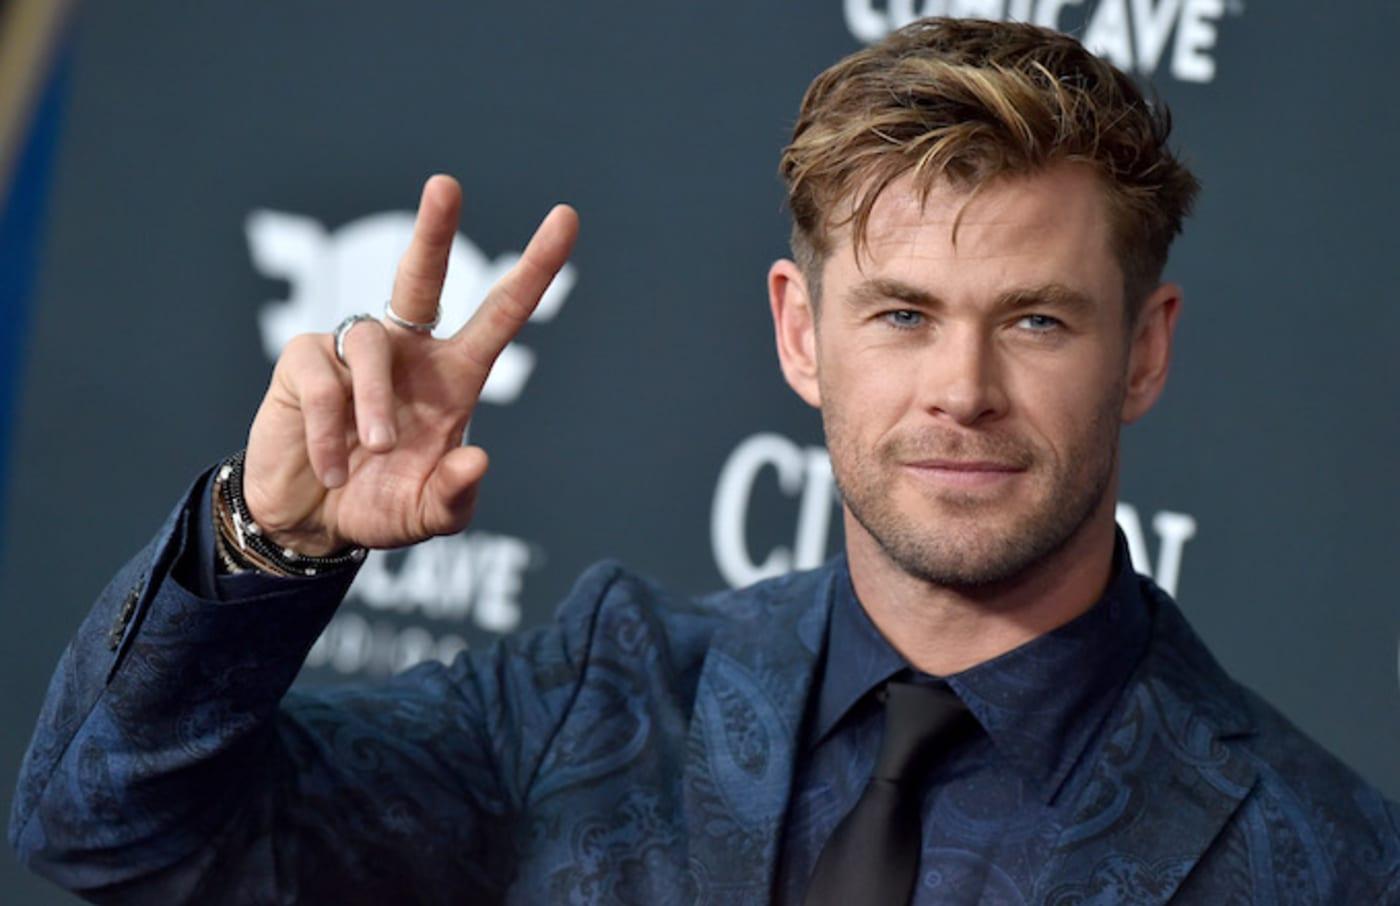 Chris Hemsworth attends the World Premiere of 'Avengers: Endgame.'